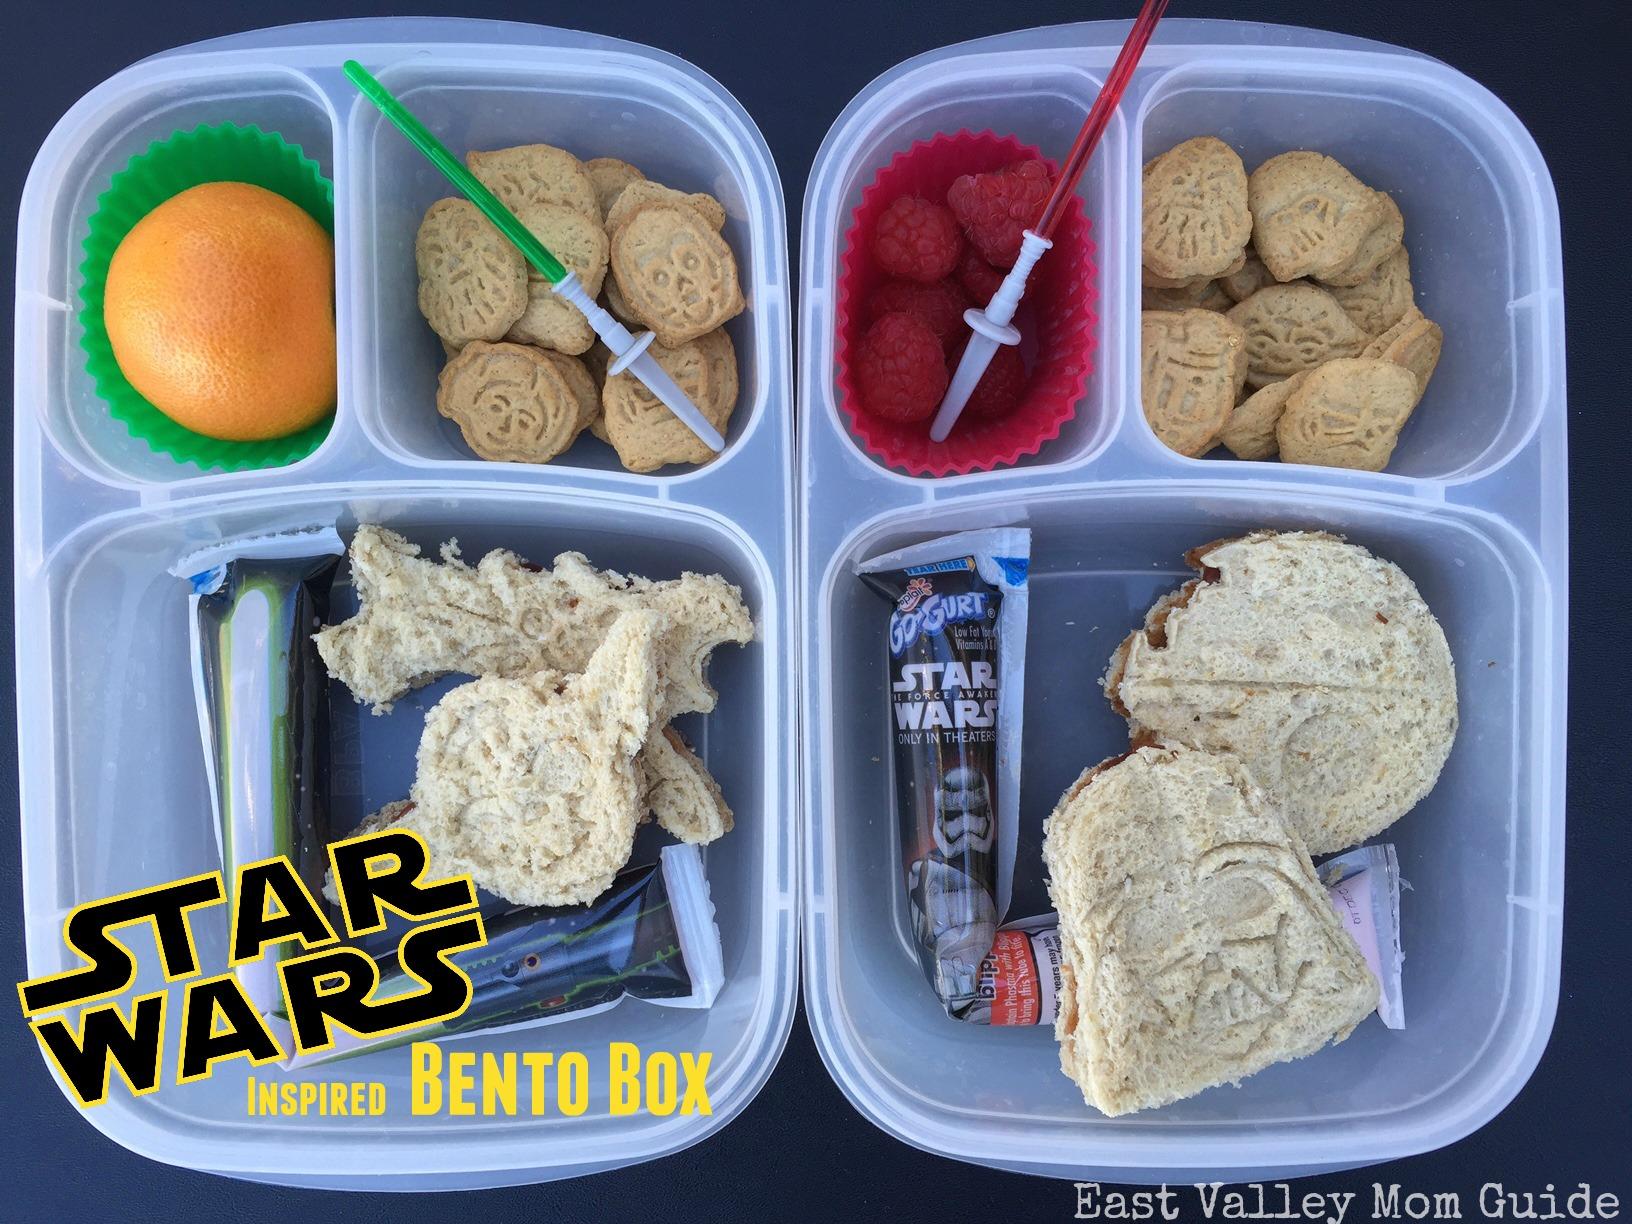 star wars inspired bento box